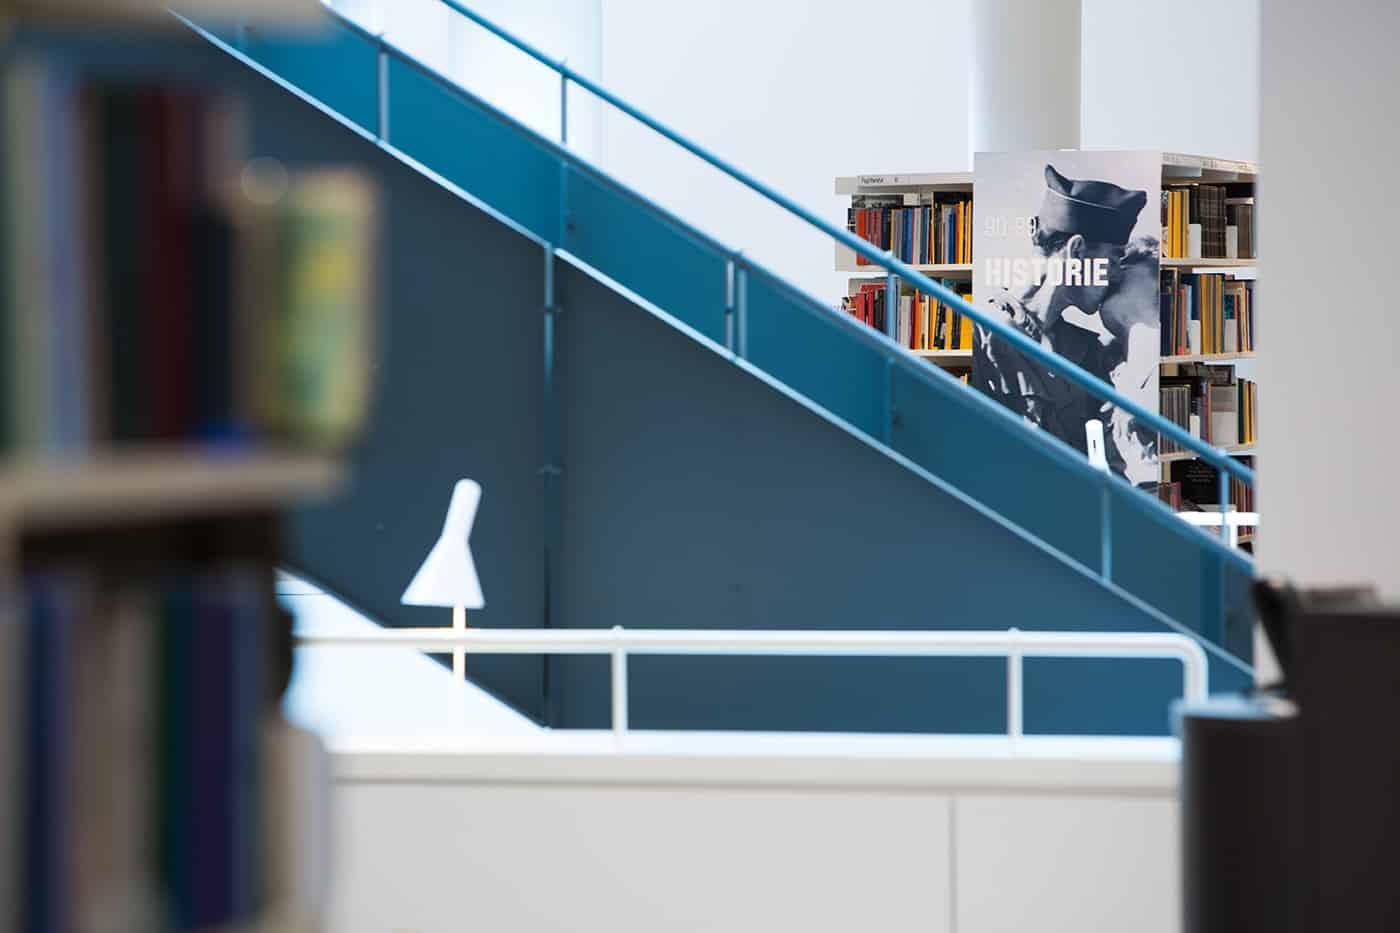 RITAarch, Indretning, spaceplanning, biblioteksdesign, biblioteksindretning, wayfinding, grafik, spaceplanning, arkitektur, Detalje, Holbæk bibliotek